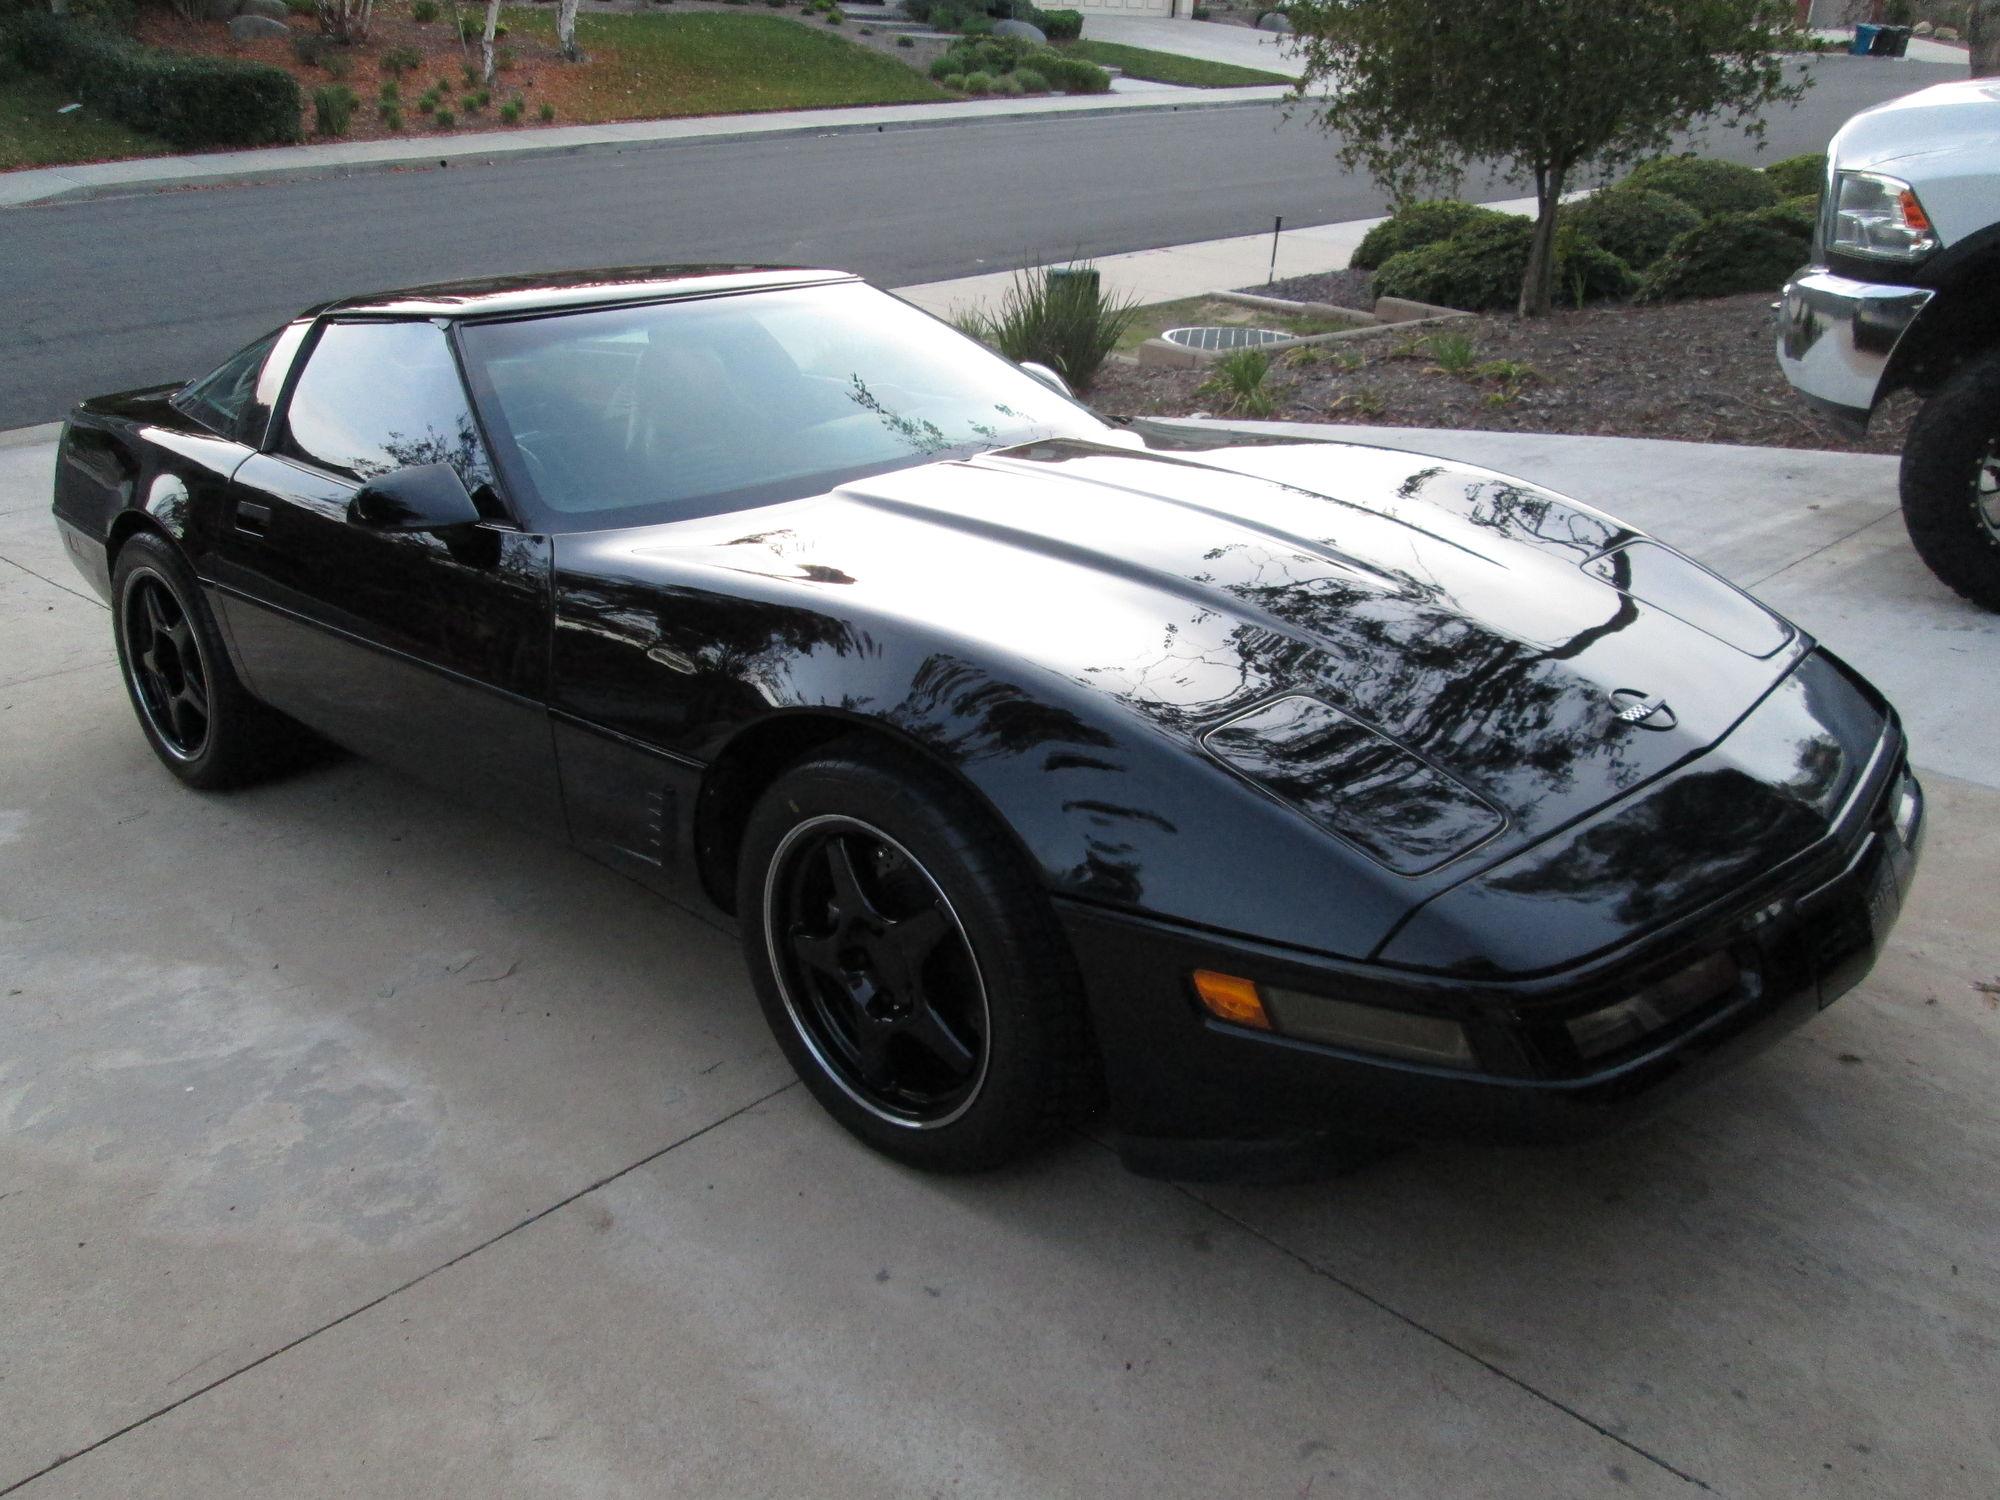 fs for sale 1996 corvette grand sport lt4 coupe 6 speed corvetteforum chevrolet corvette. Black Bedroom Furniture Sets. Home Design Ideas